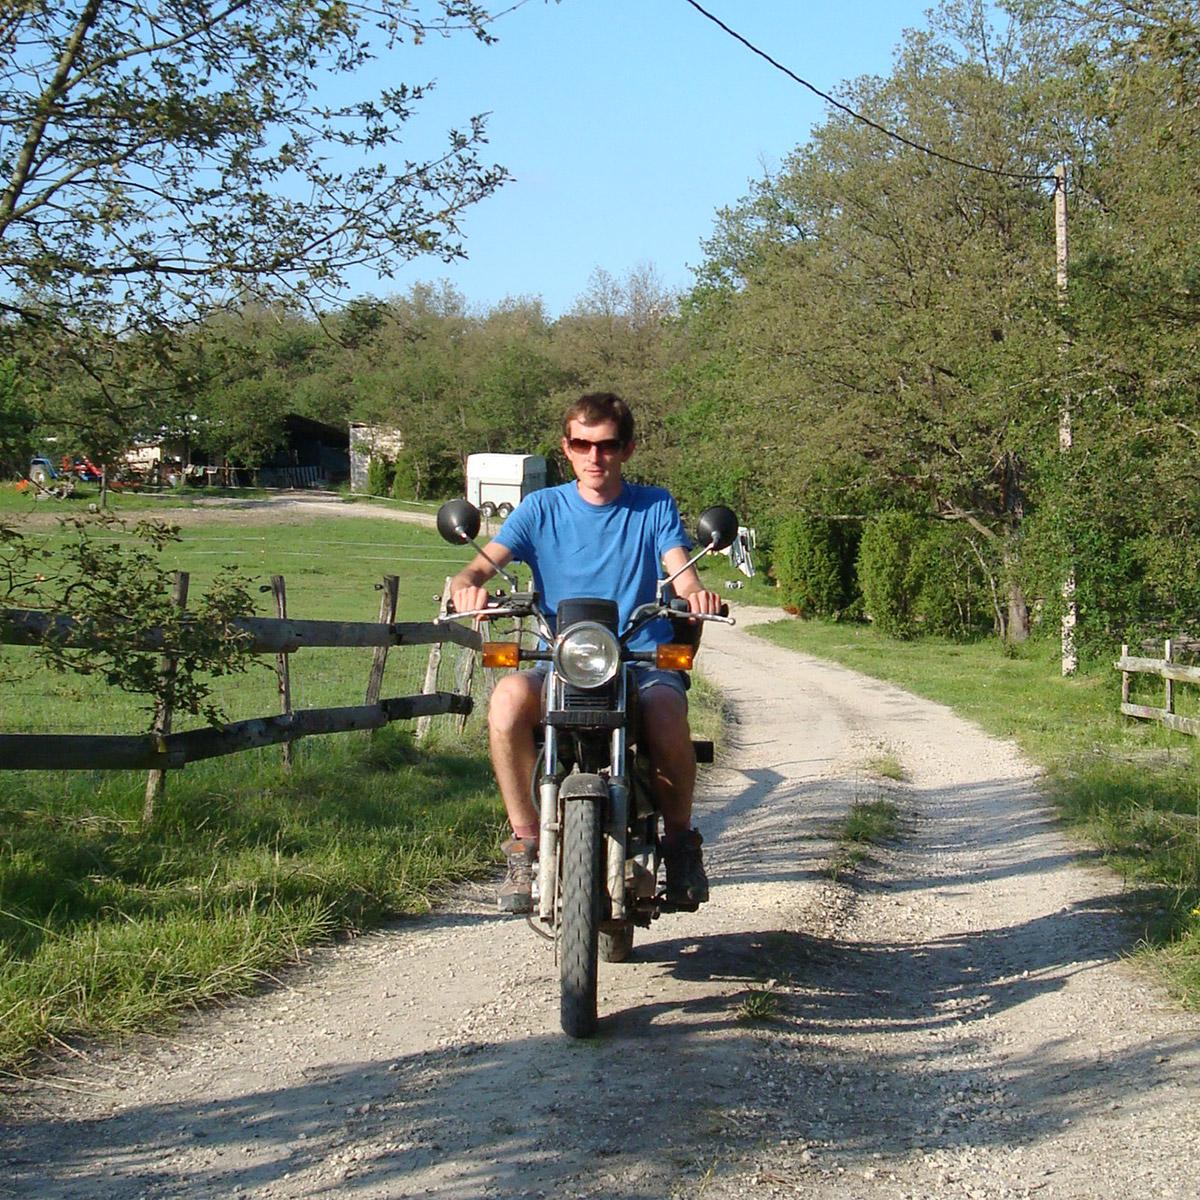 Man riding motorbike on dirt track.